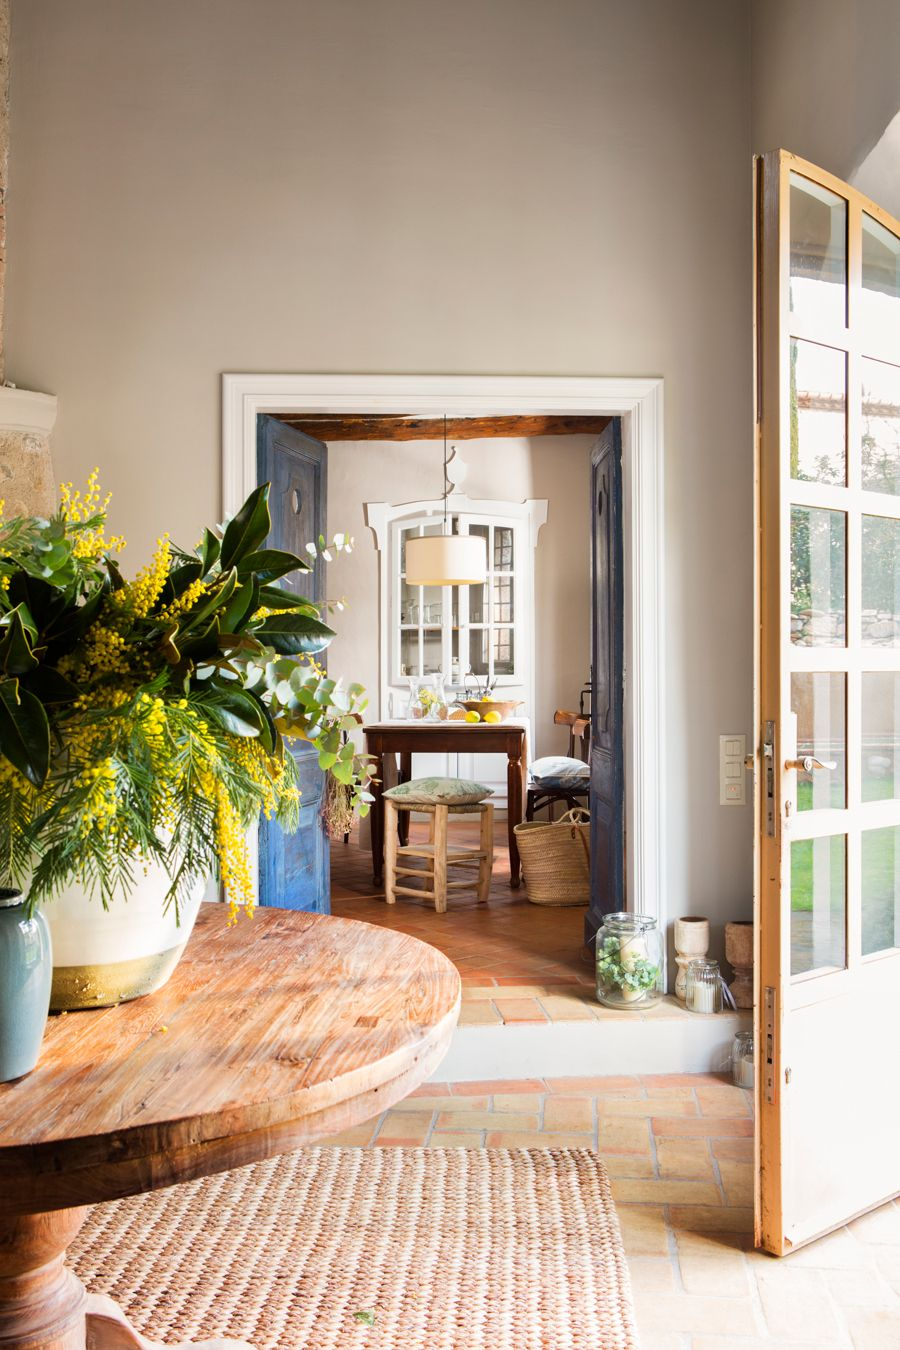 Recibidor con puerta abierta de cristalera alfombra de fibras, mesa ...